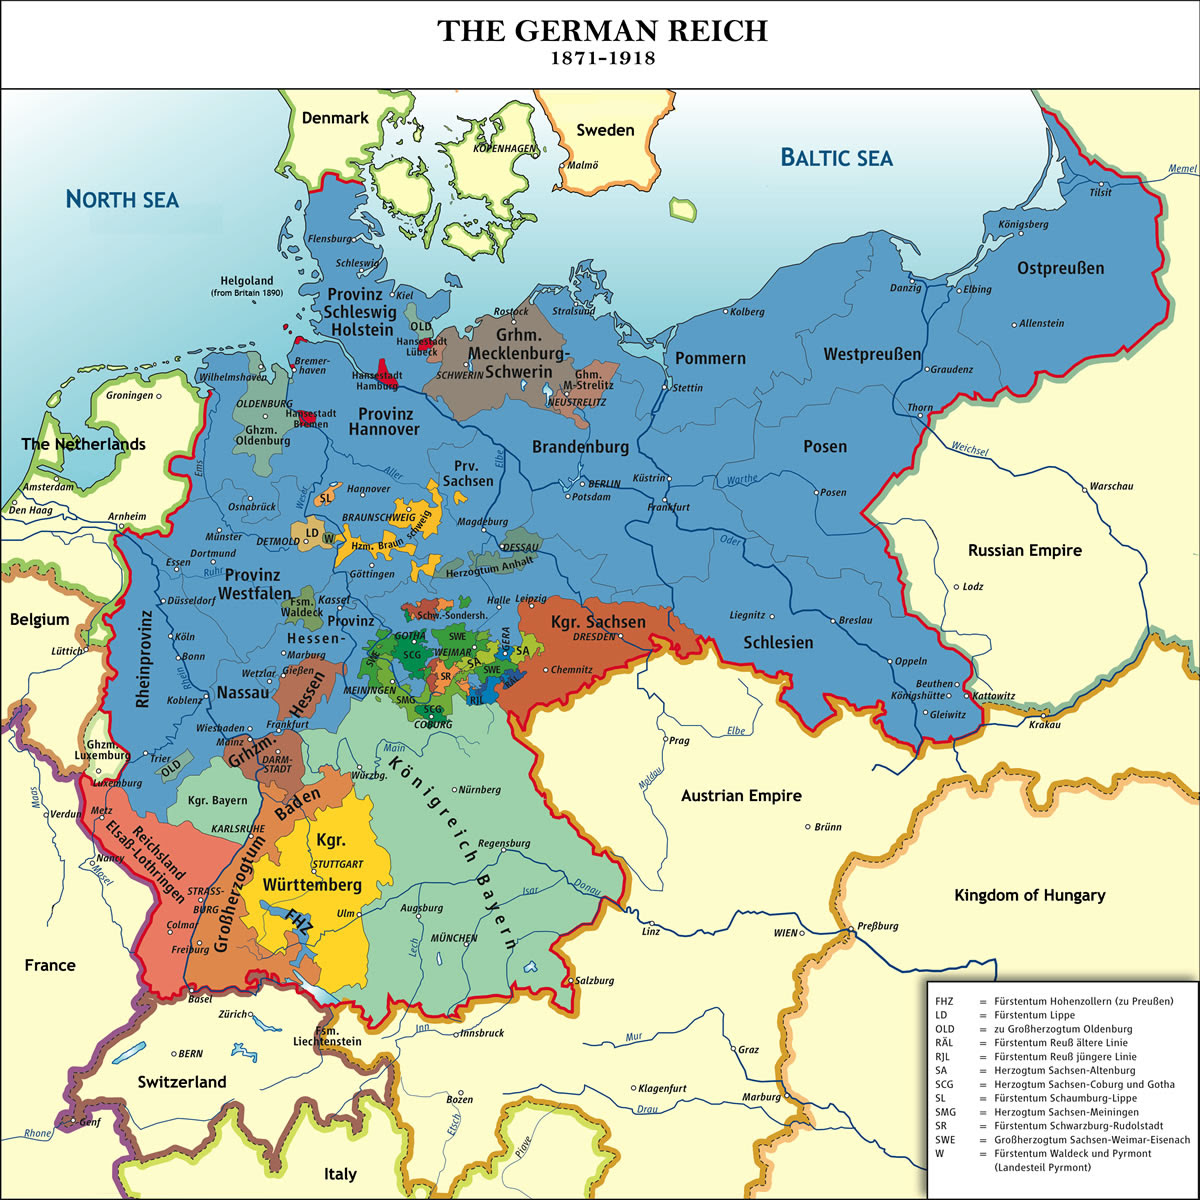 A WWI era map of Germany